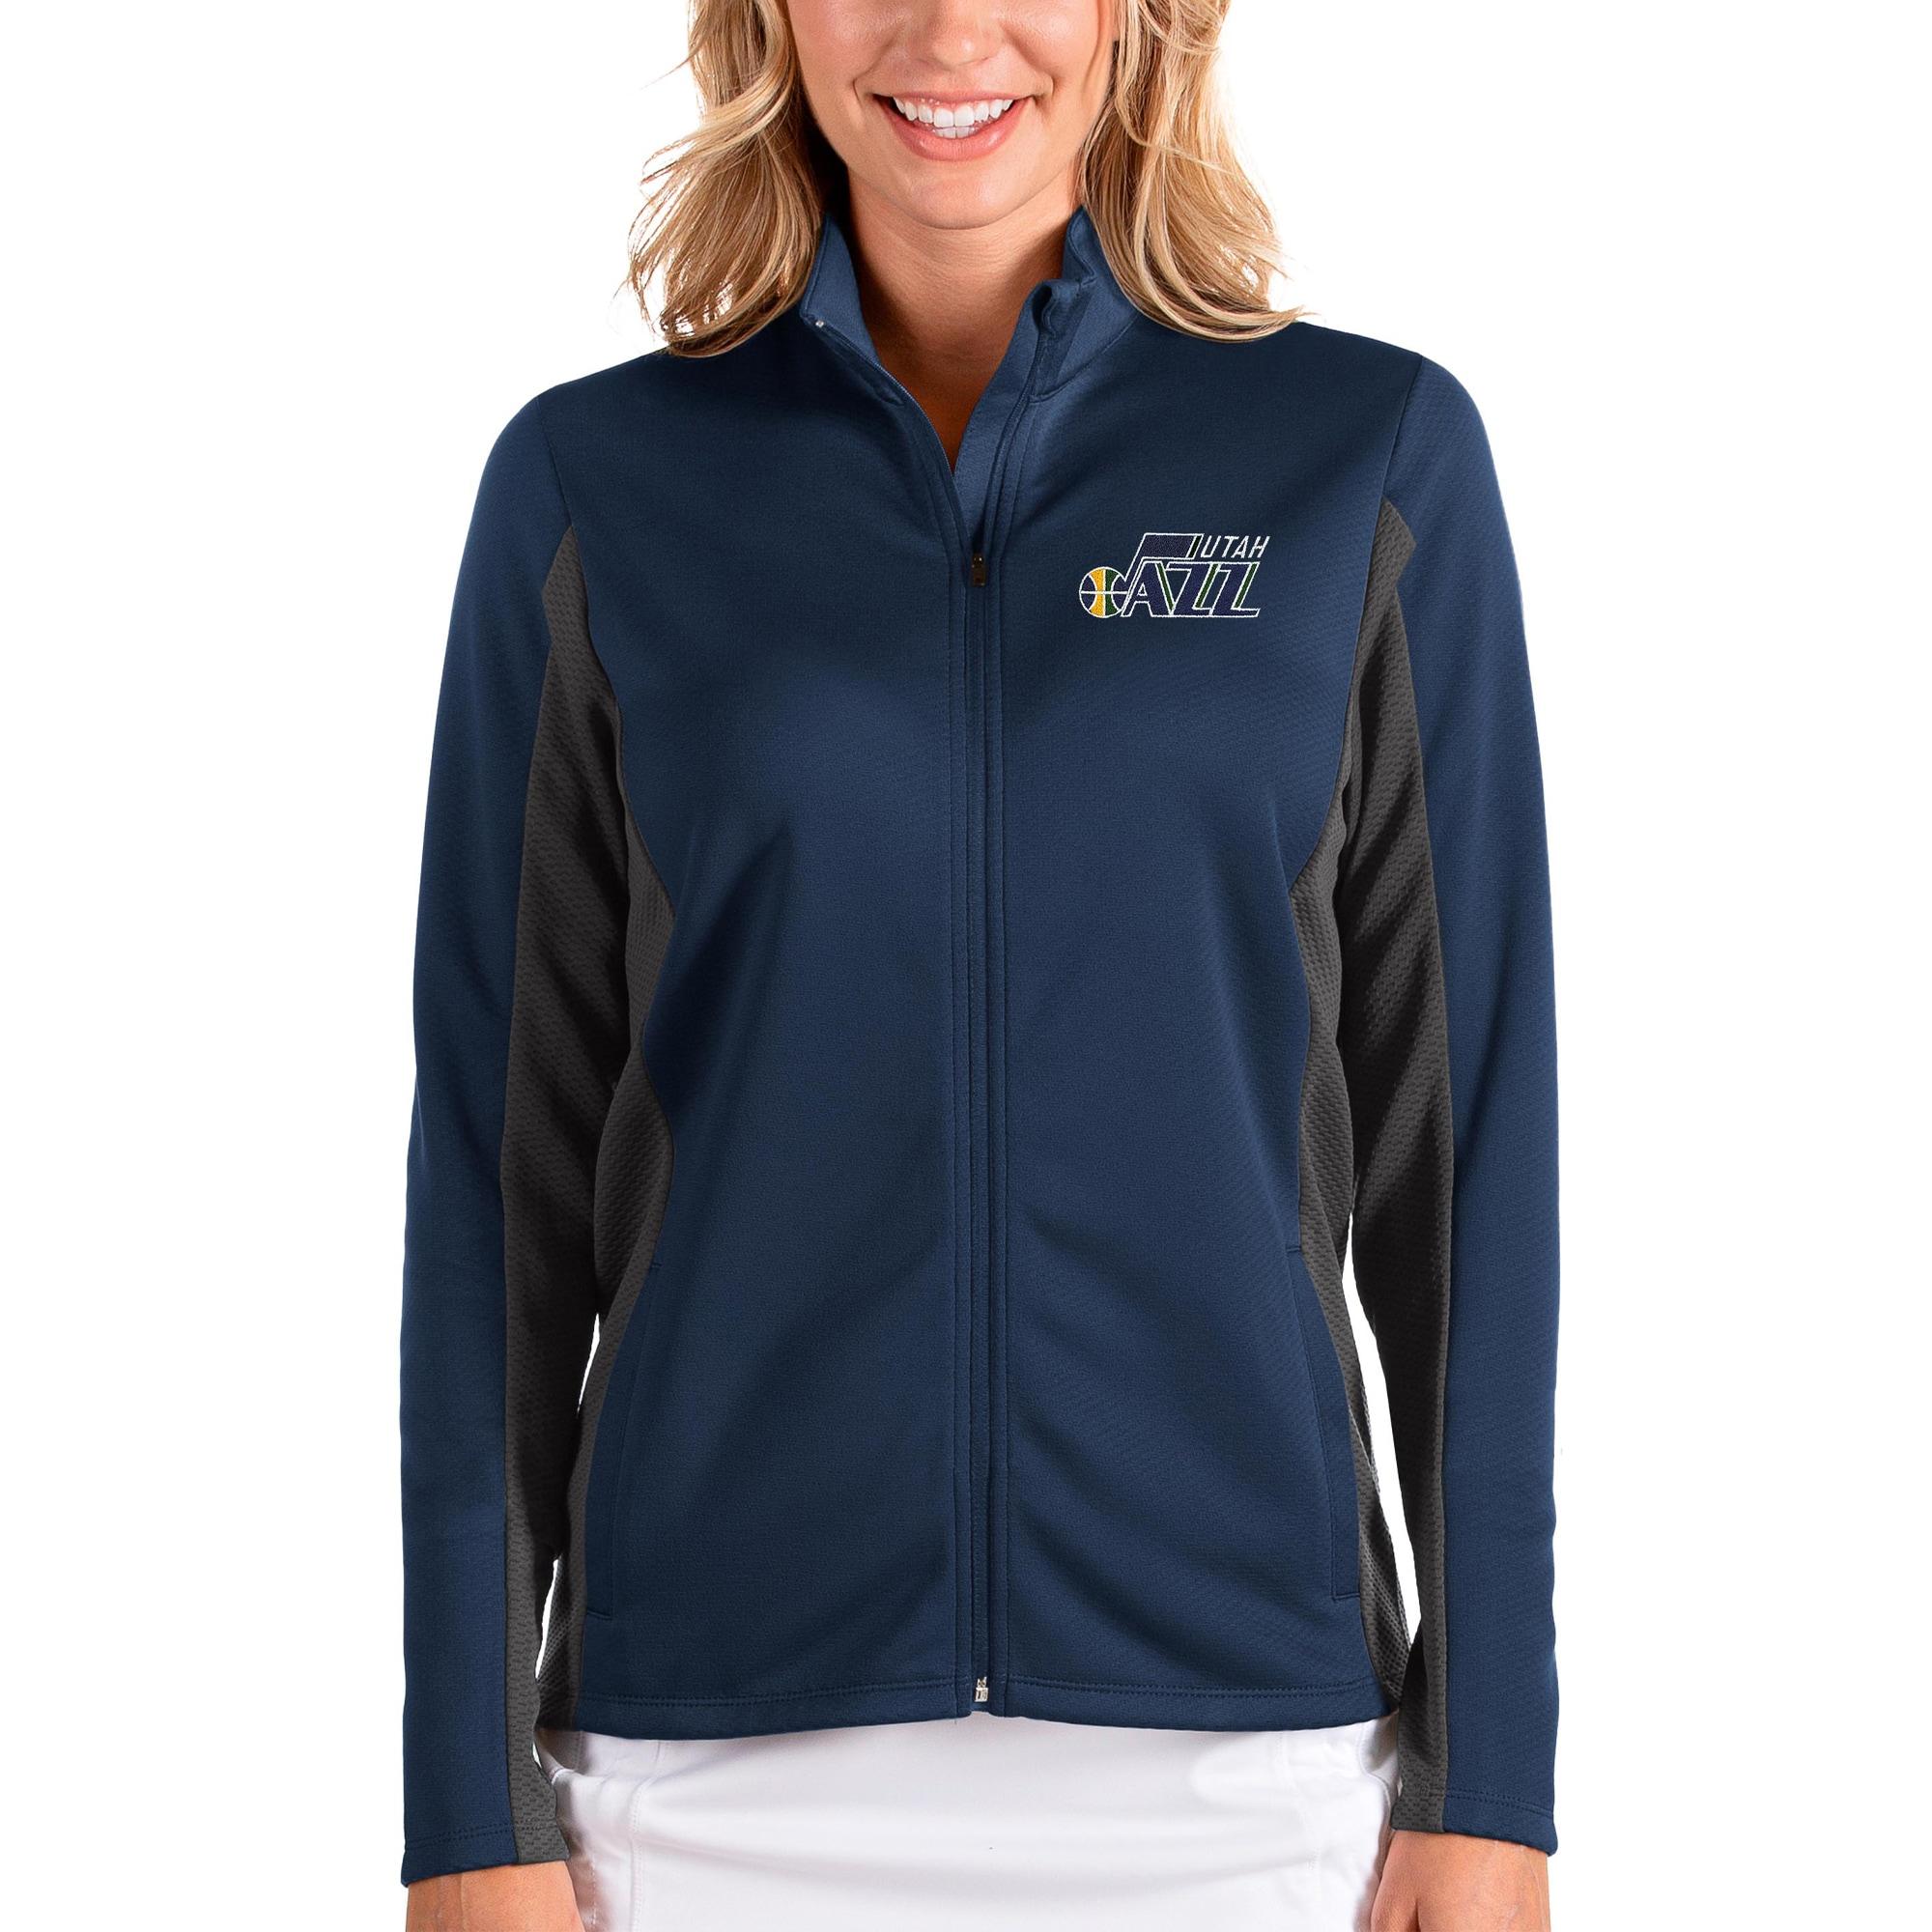 Utah Jazz Antigua Women's Passage Full-Zip Jacket - Navy/Charcoal